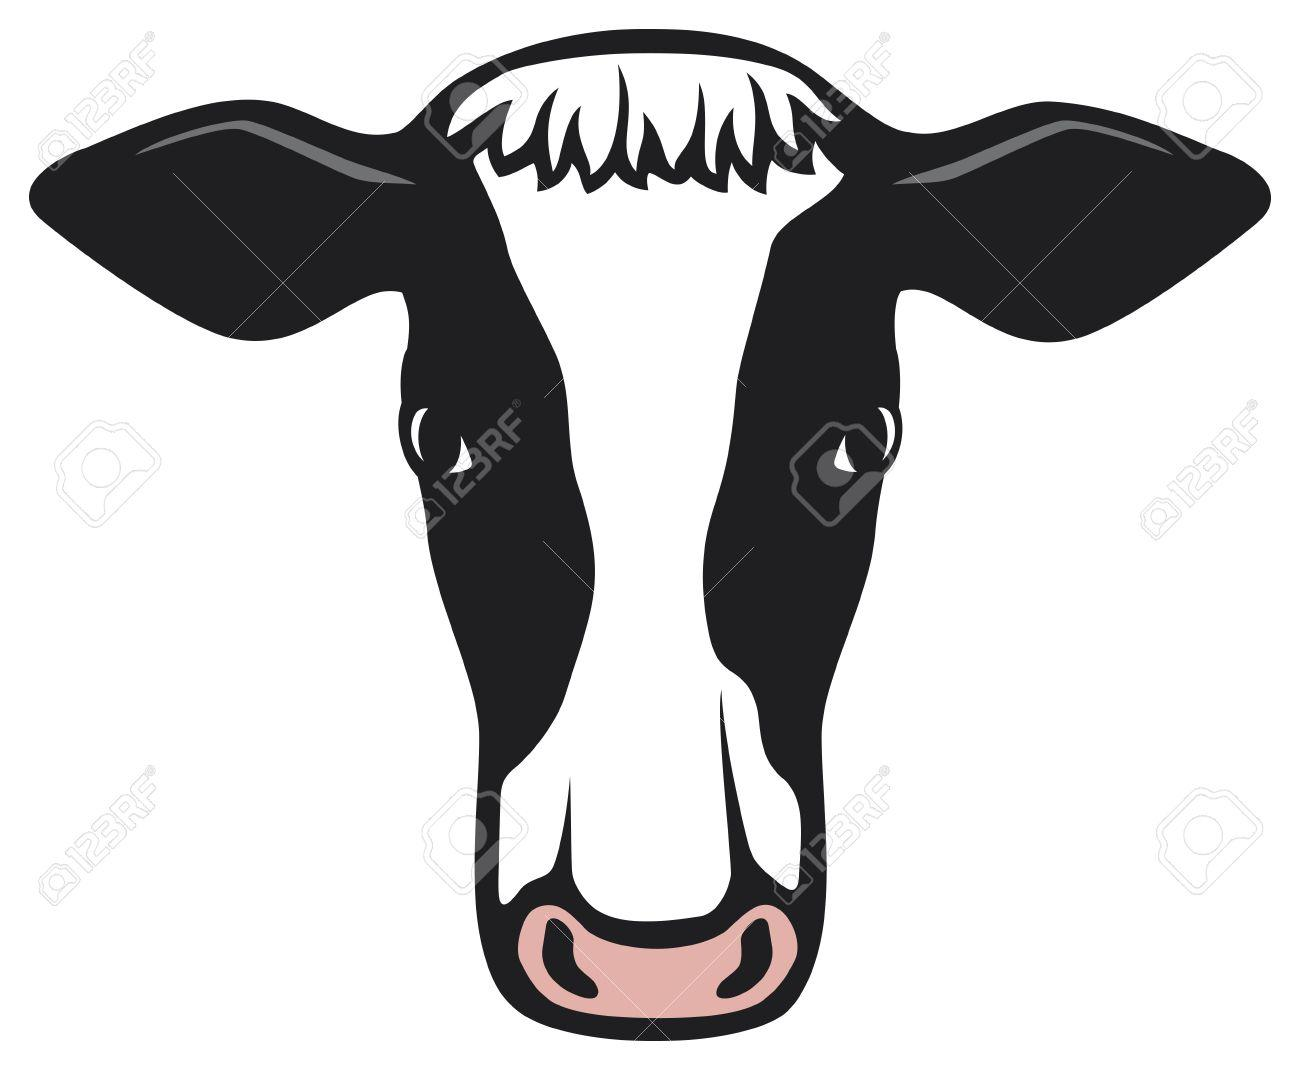 Cartoon Cow Faces - ClipArt Best